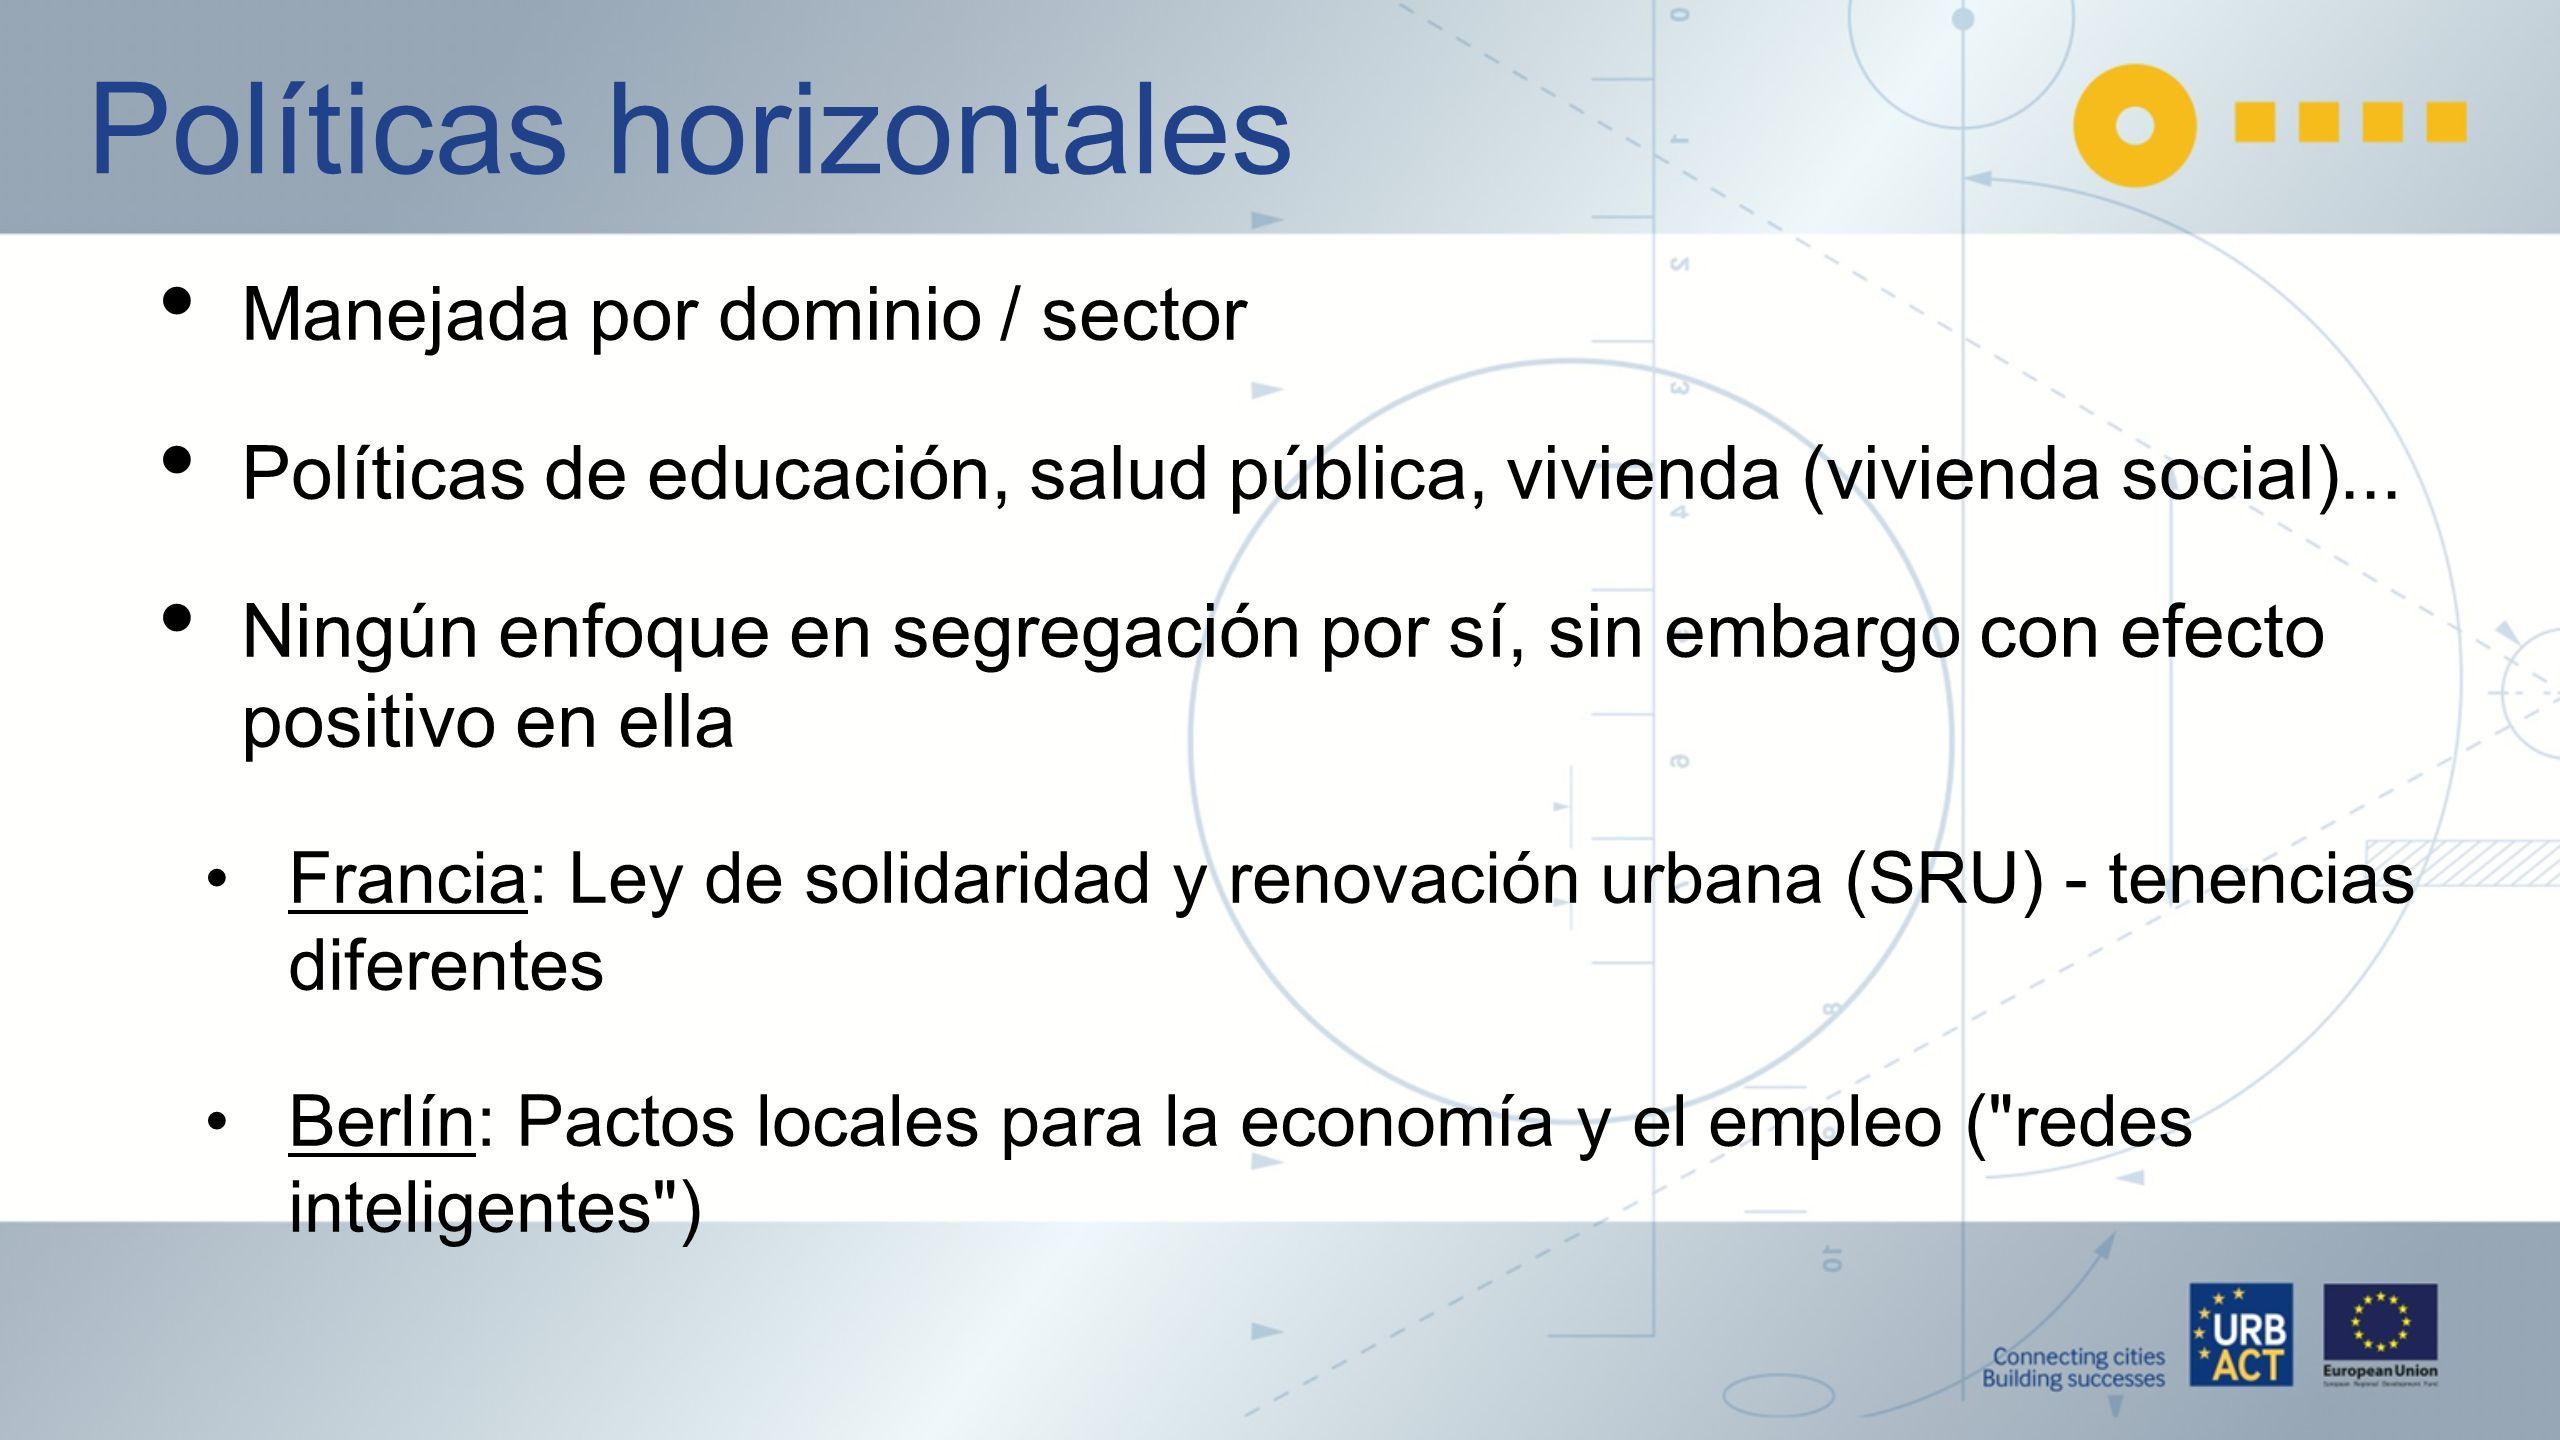 Políticas horizontales